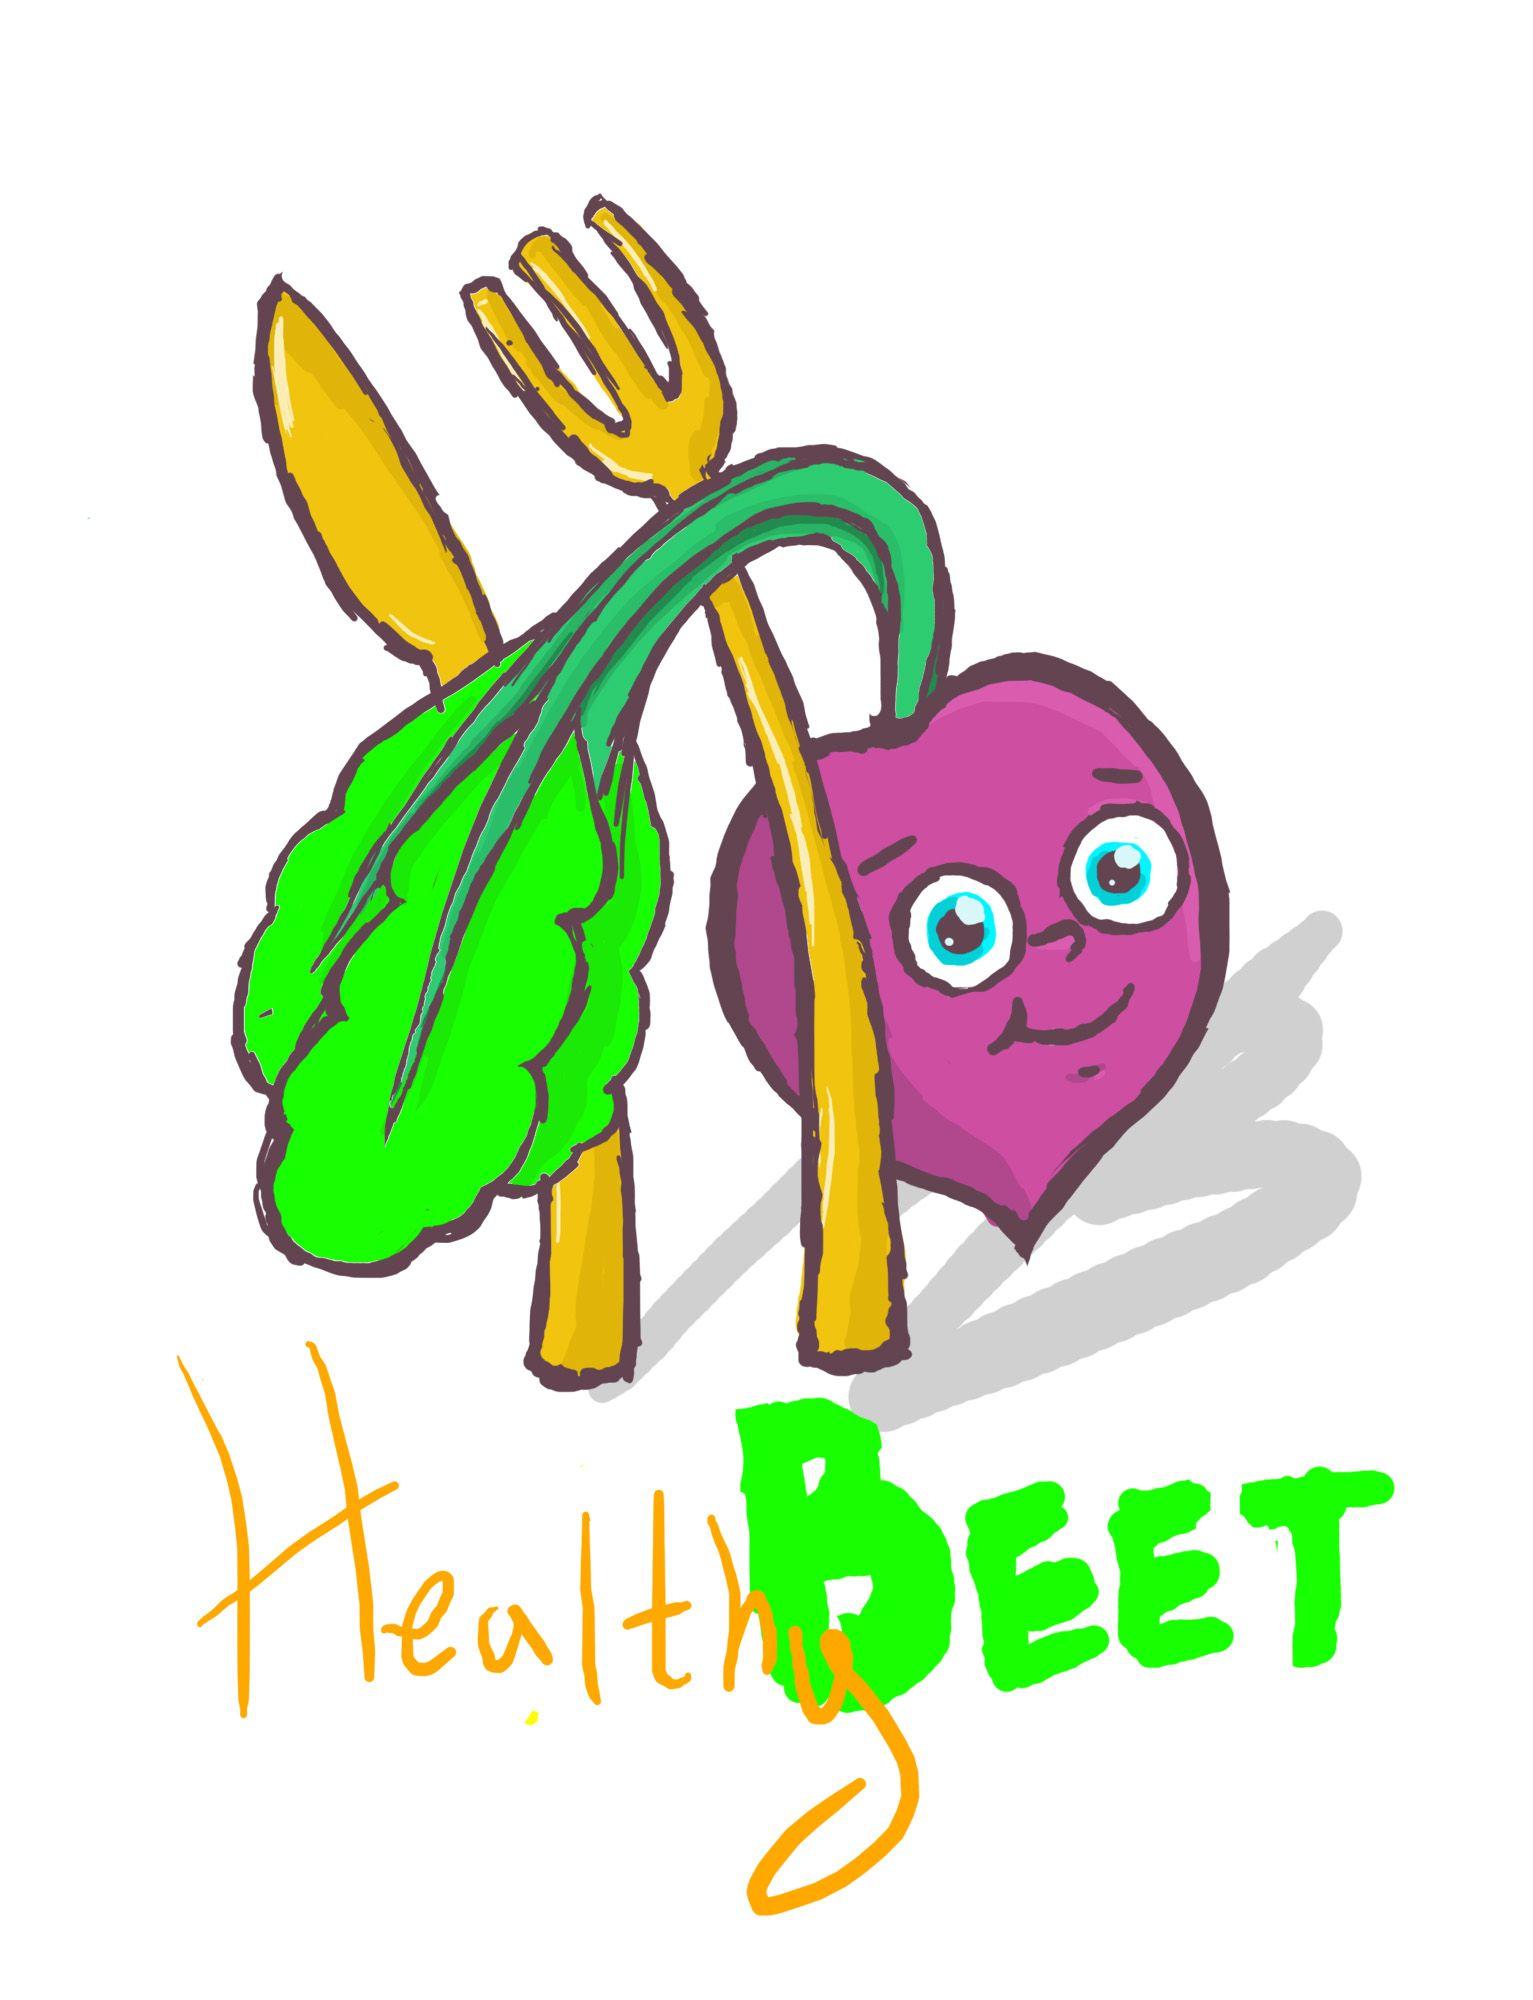 Healthy Bit или Healthy Beet - дизайнер hedgehog